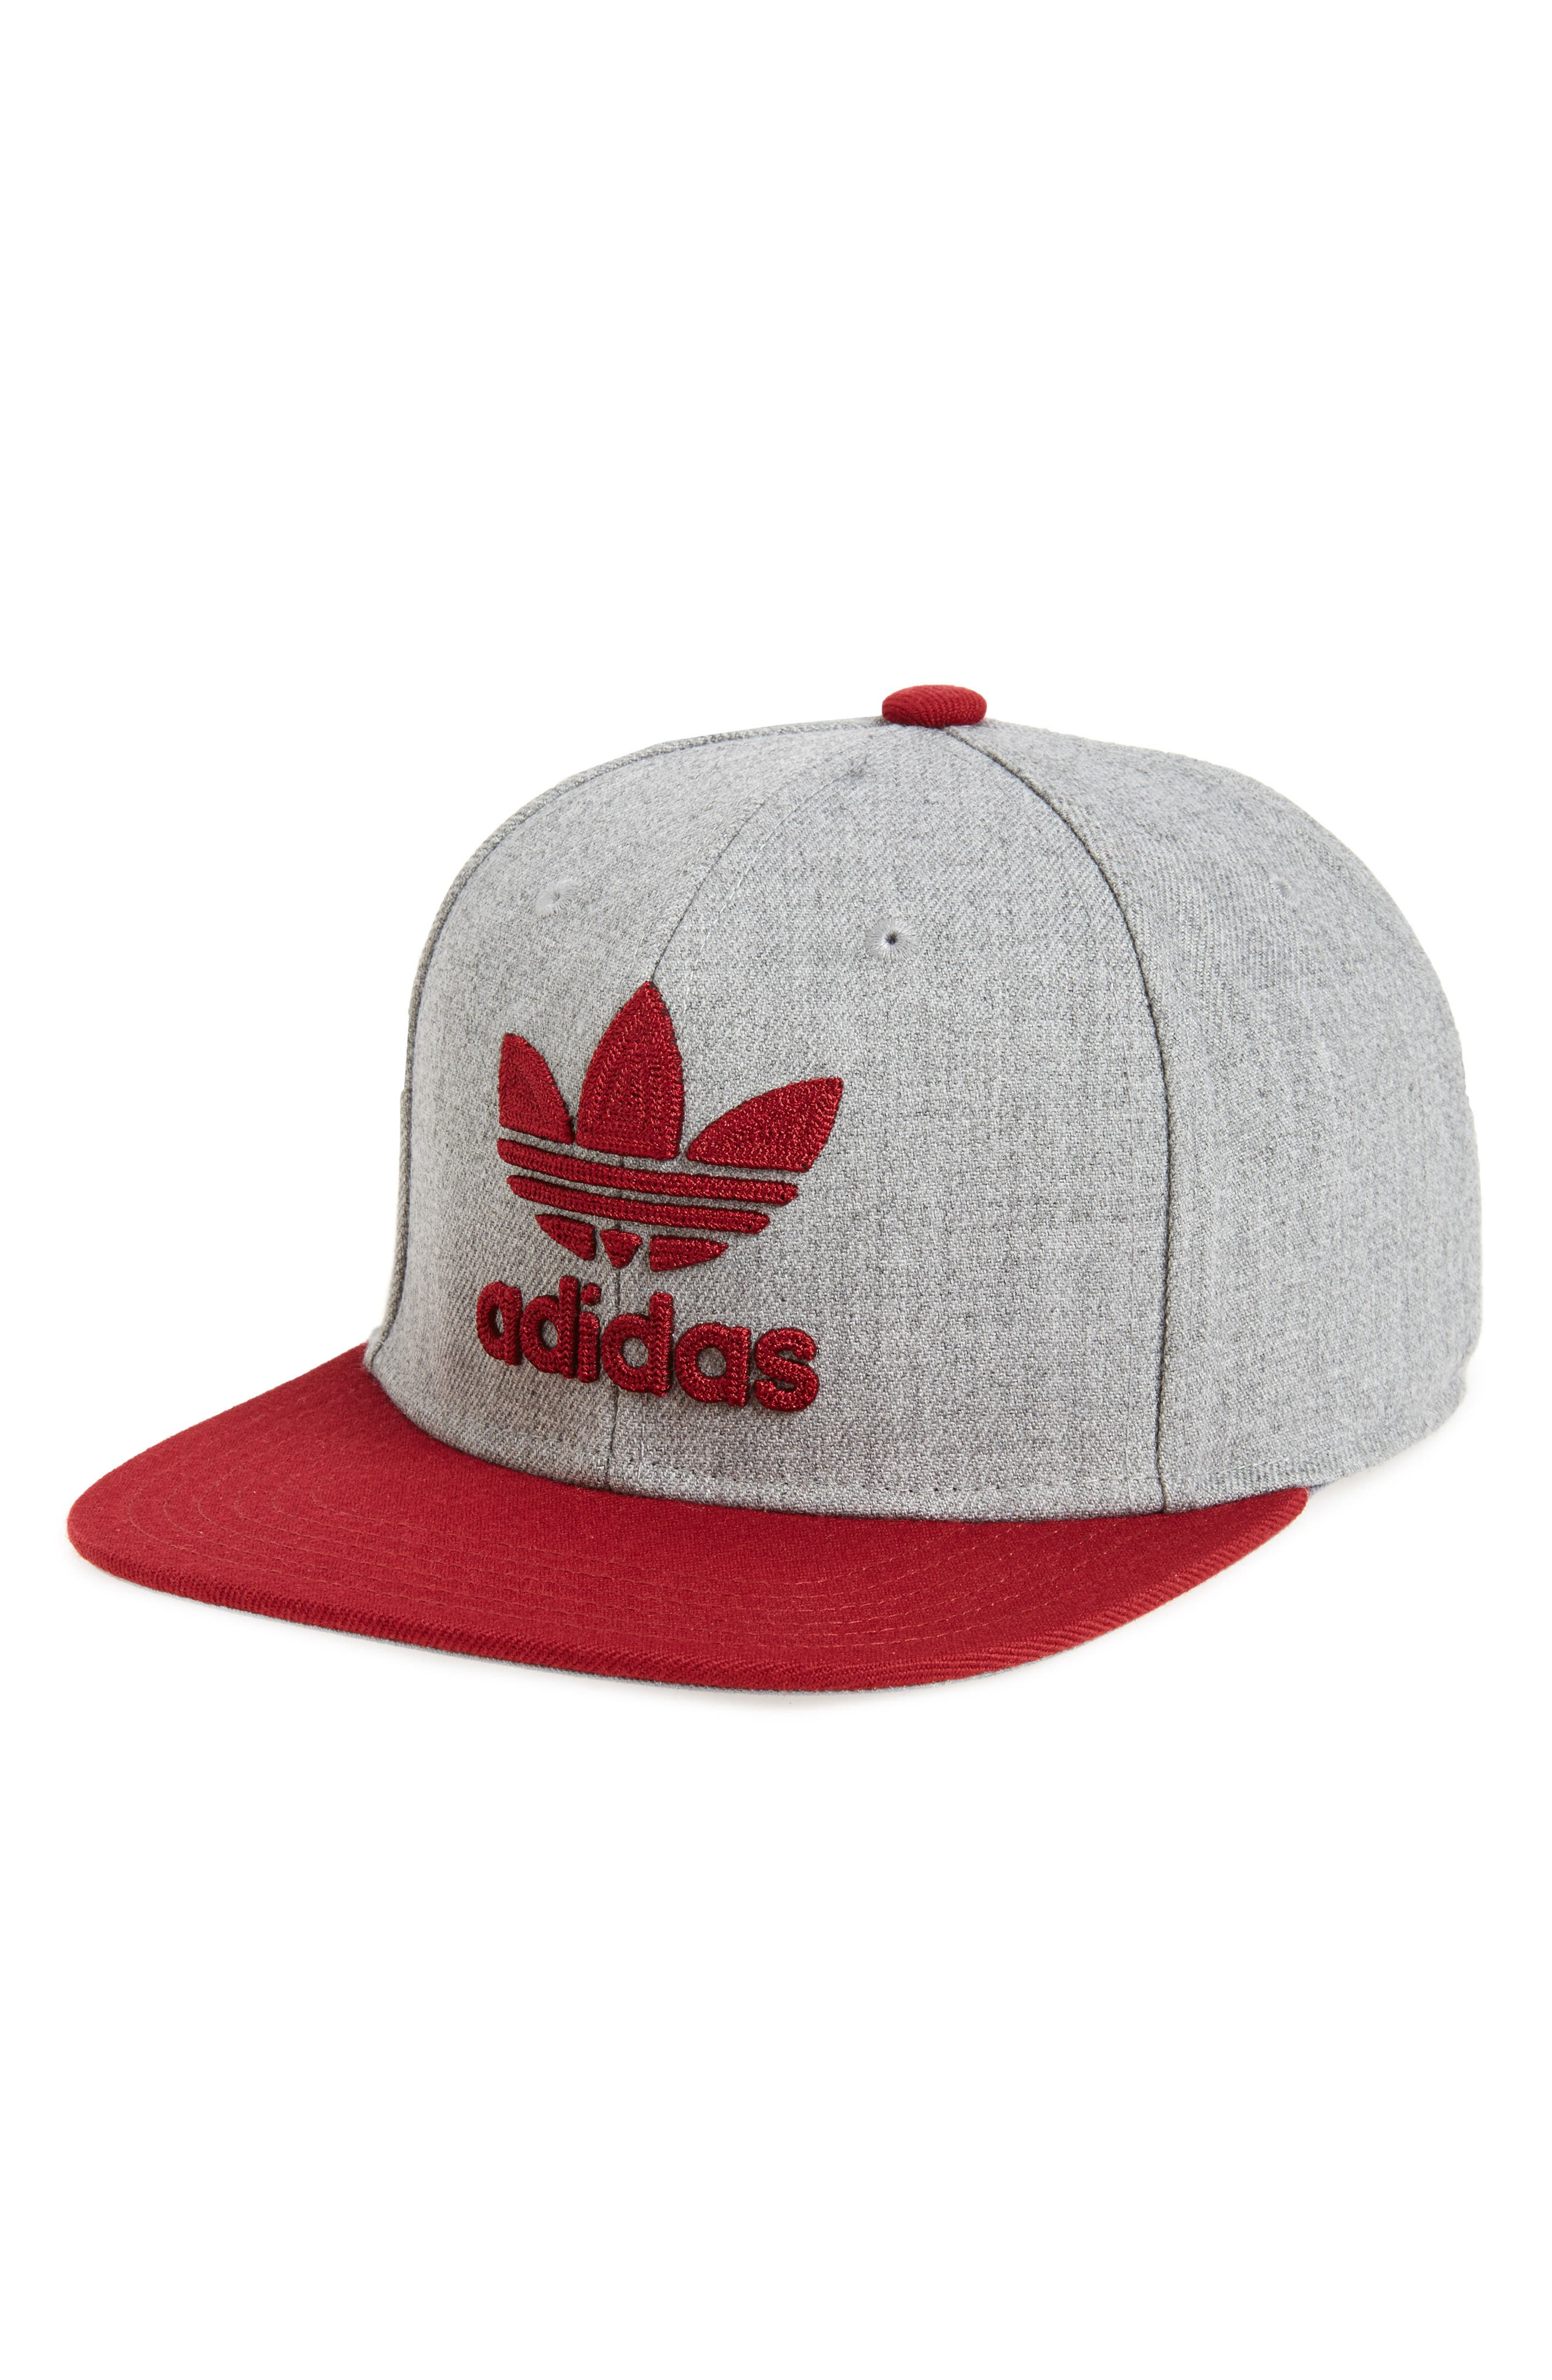 Alternate Image 1 Selected - adidas Originals 'Trefoil Chain' Snapback Cap